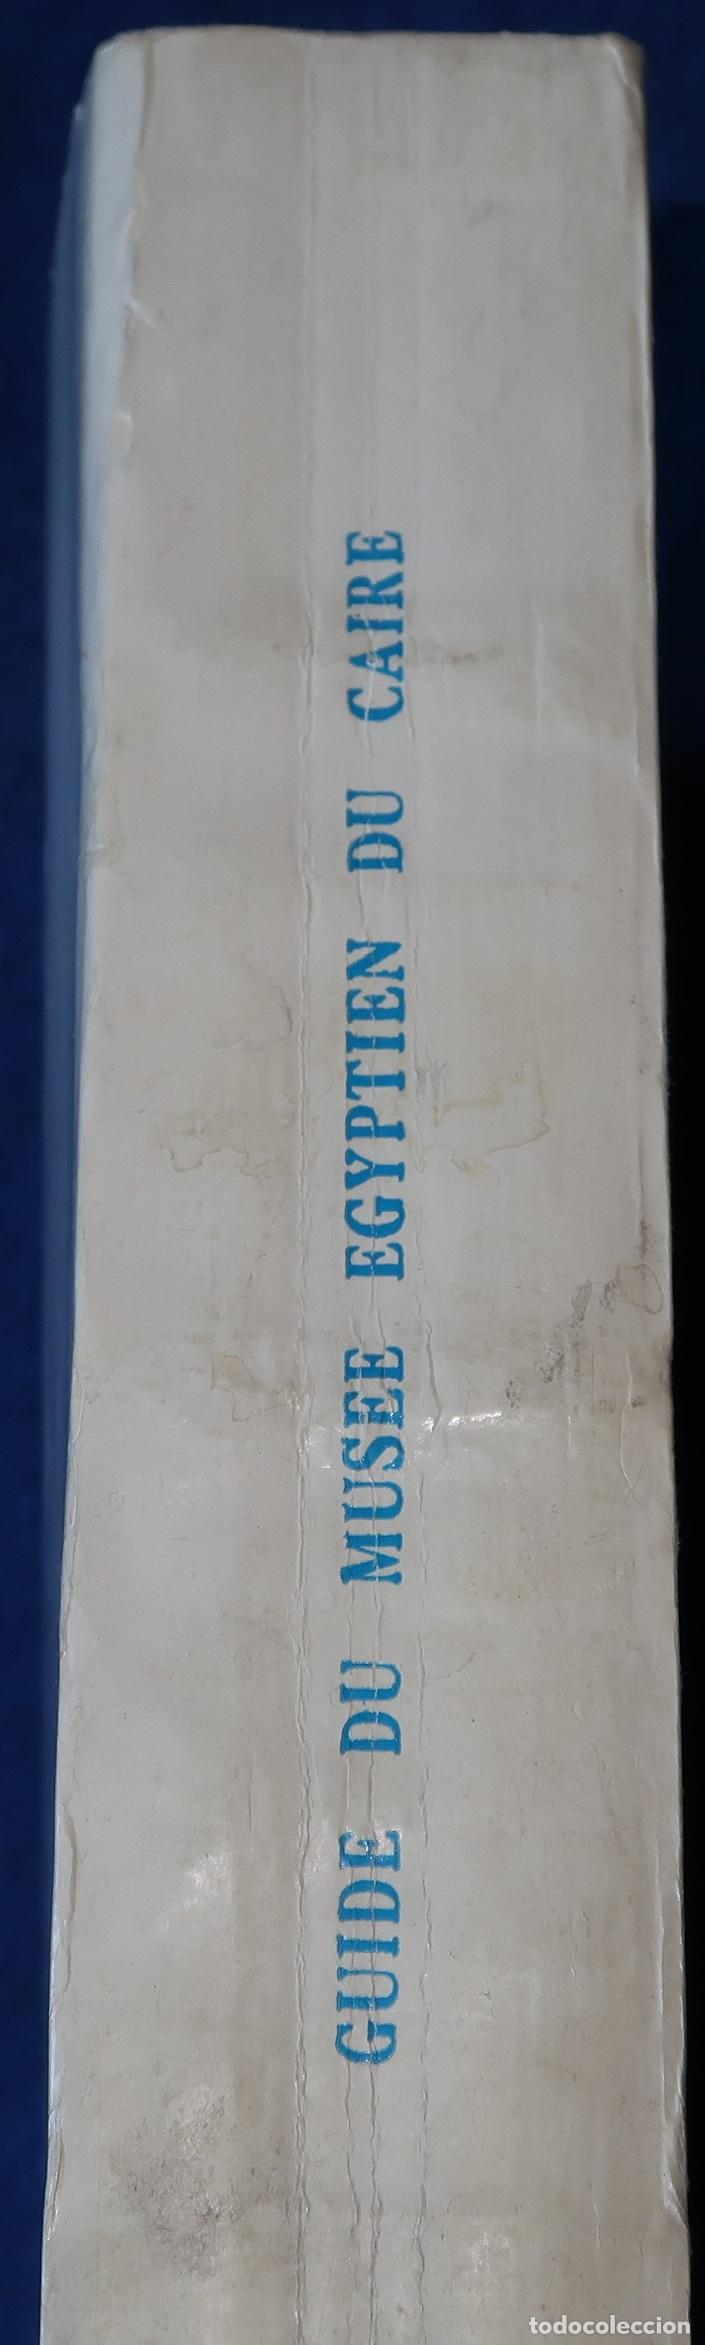 Libros de segunda mano: Guide du Musee Egyptien du Caire - Ministere de le culture (1964) - Foto 9 - 213761127